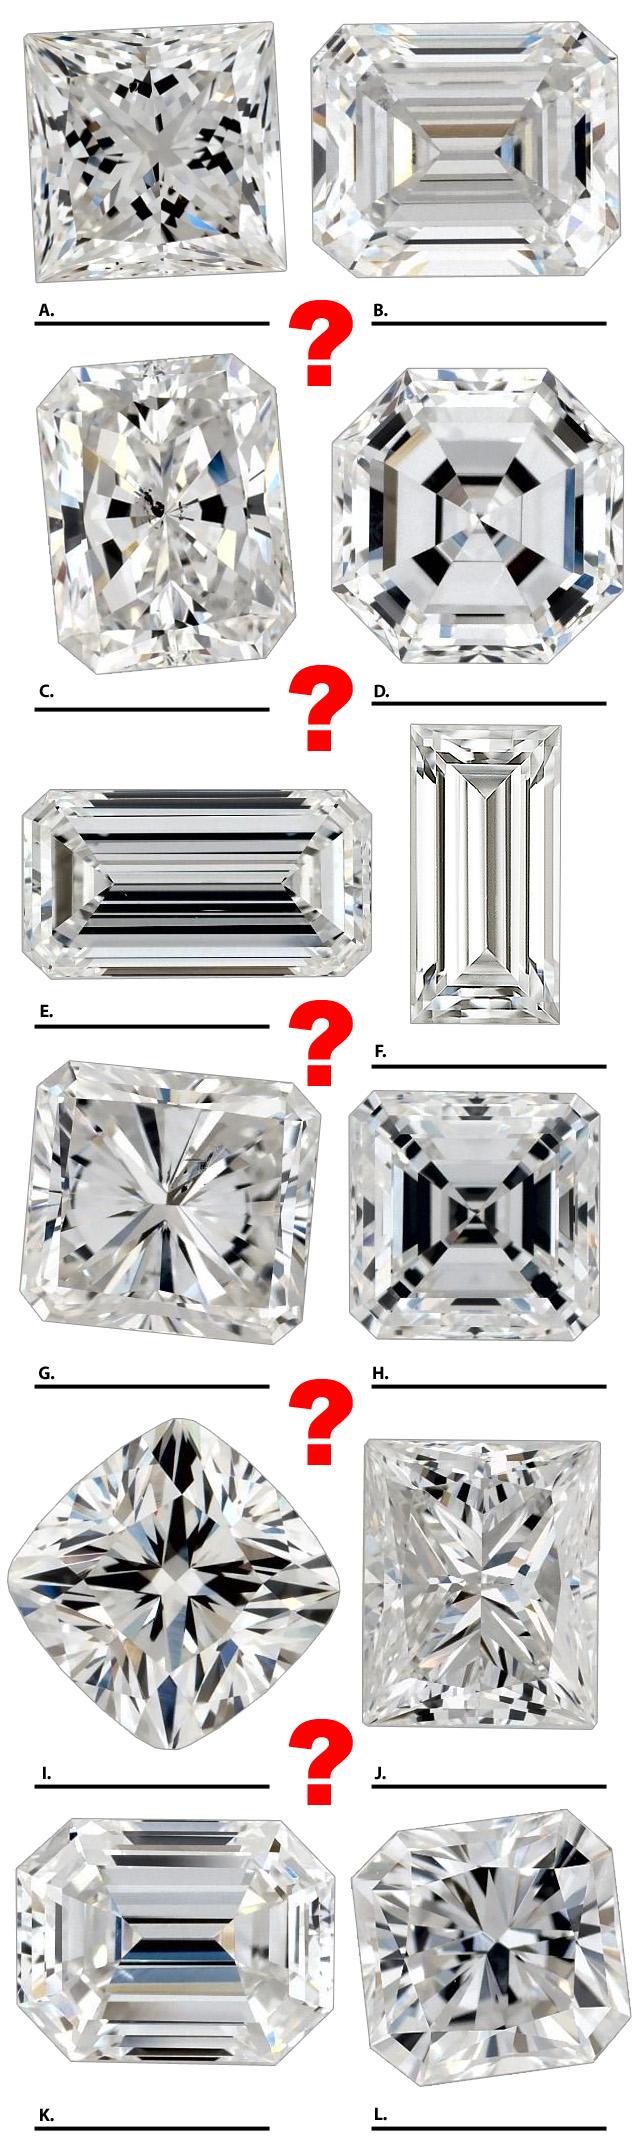 Different Square Cut Diamonds